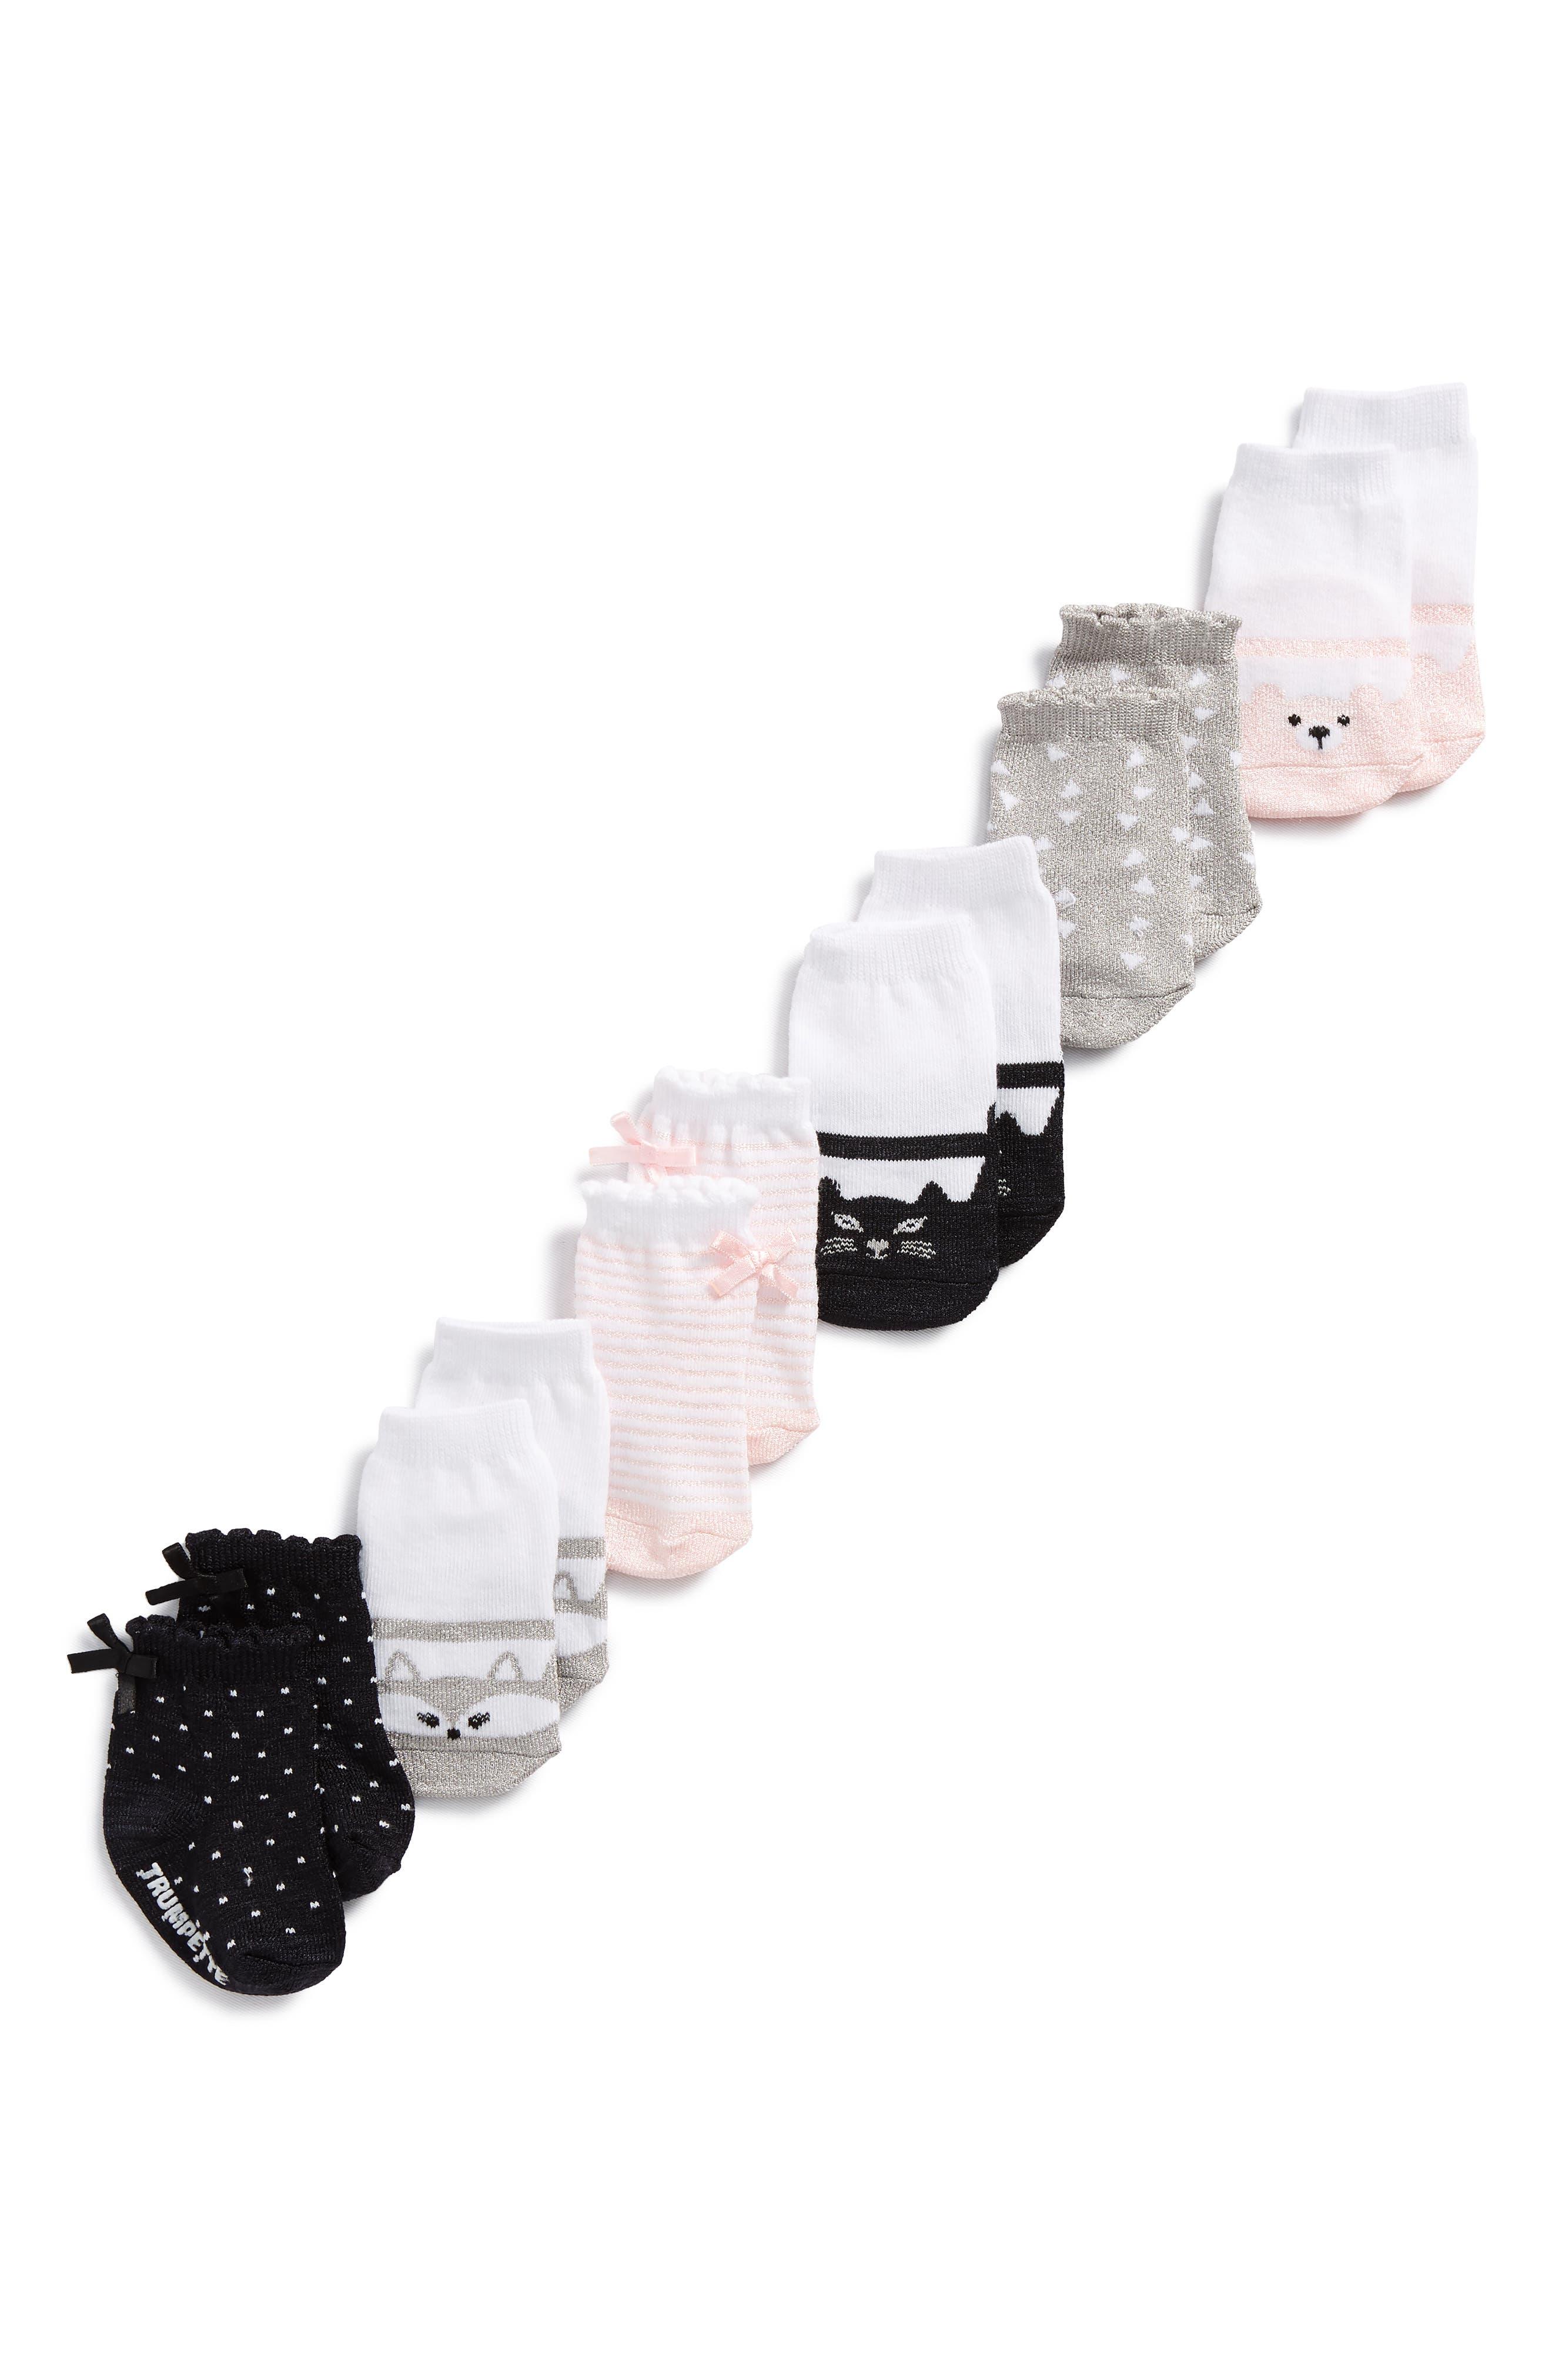 Ella's 6-Pack Socks,                             Alternate thumbnail 2, color,                             100